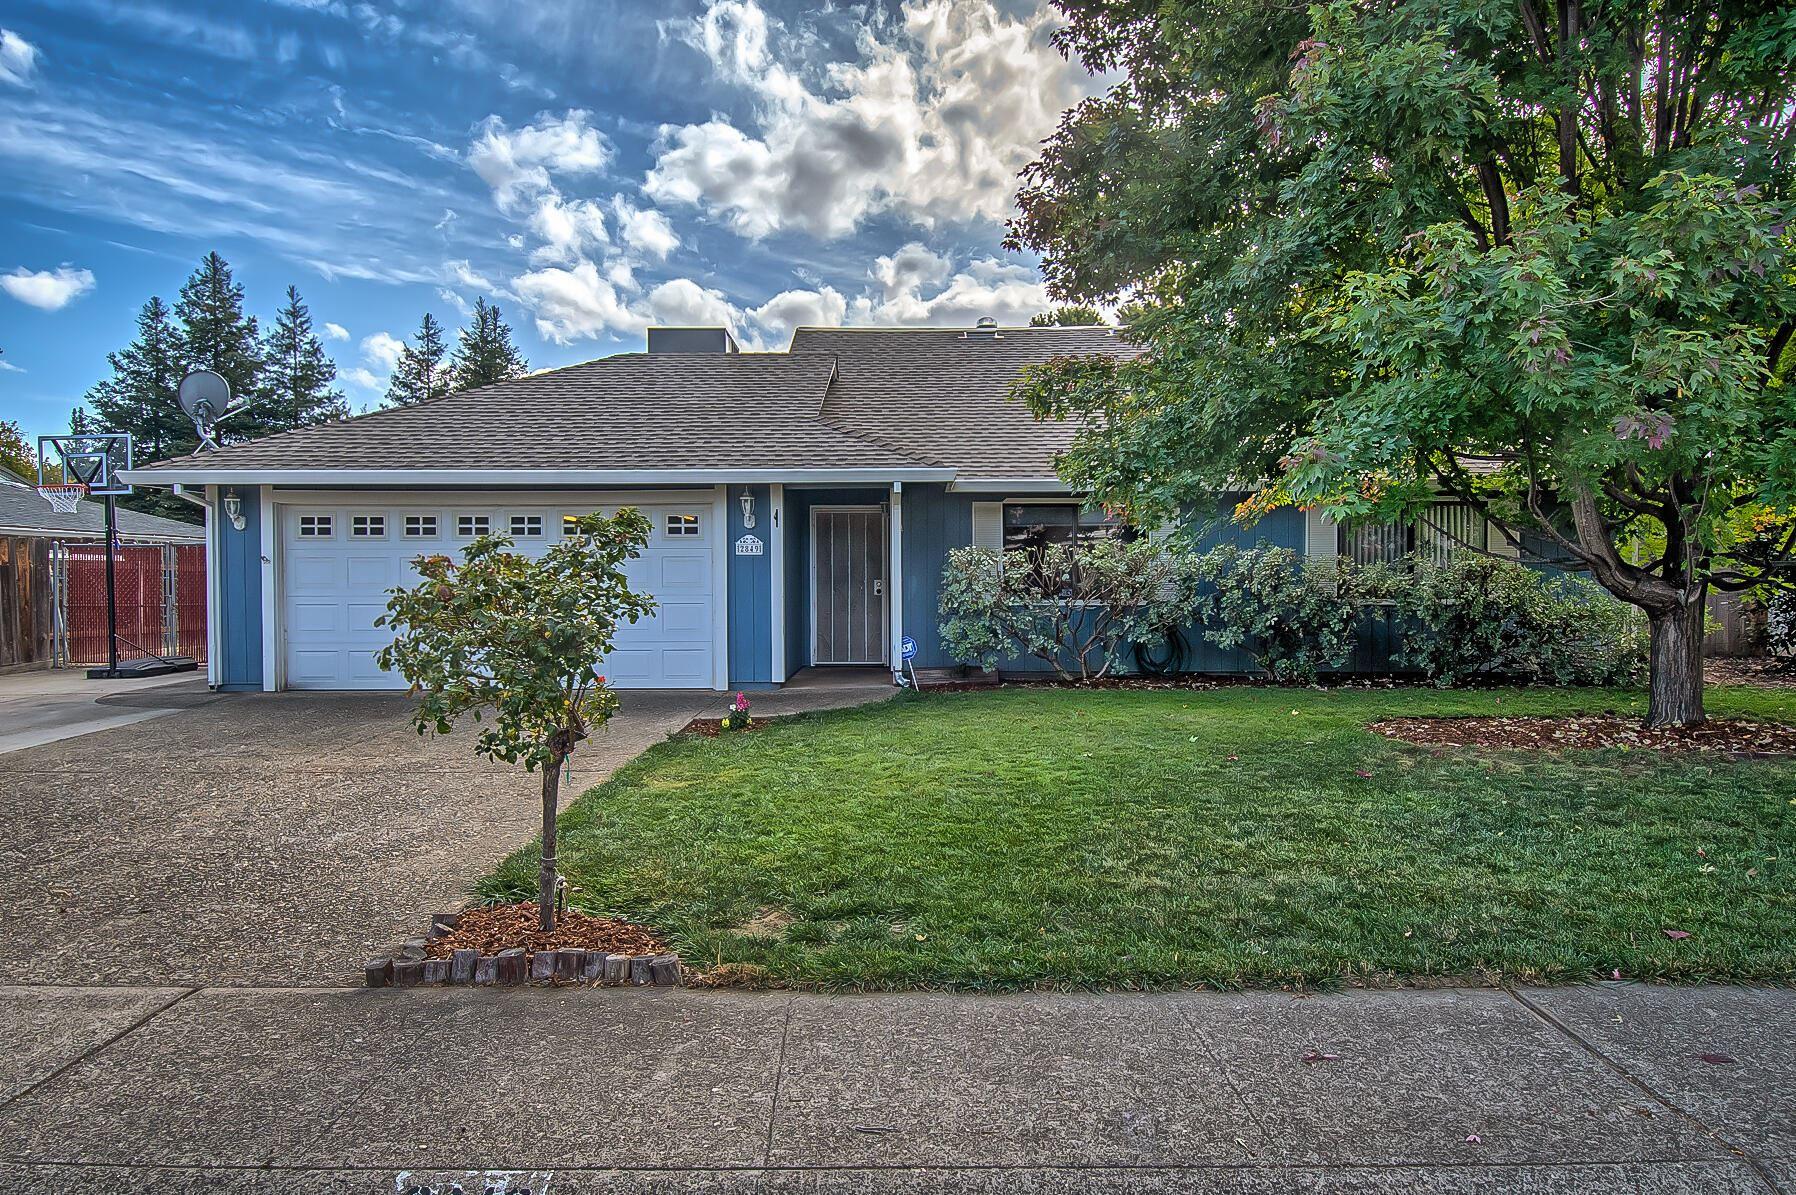 Photo of 2849 Sandalwood St, Redding, CA 96001 (MLS # 21-4805)